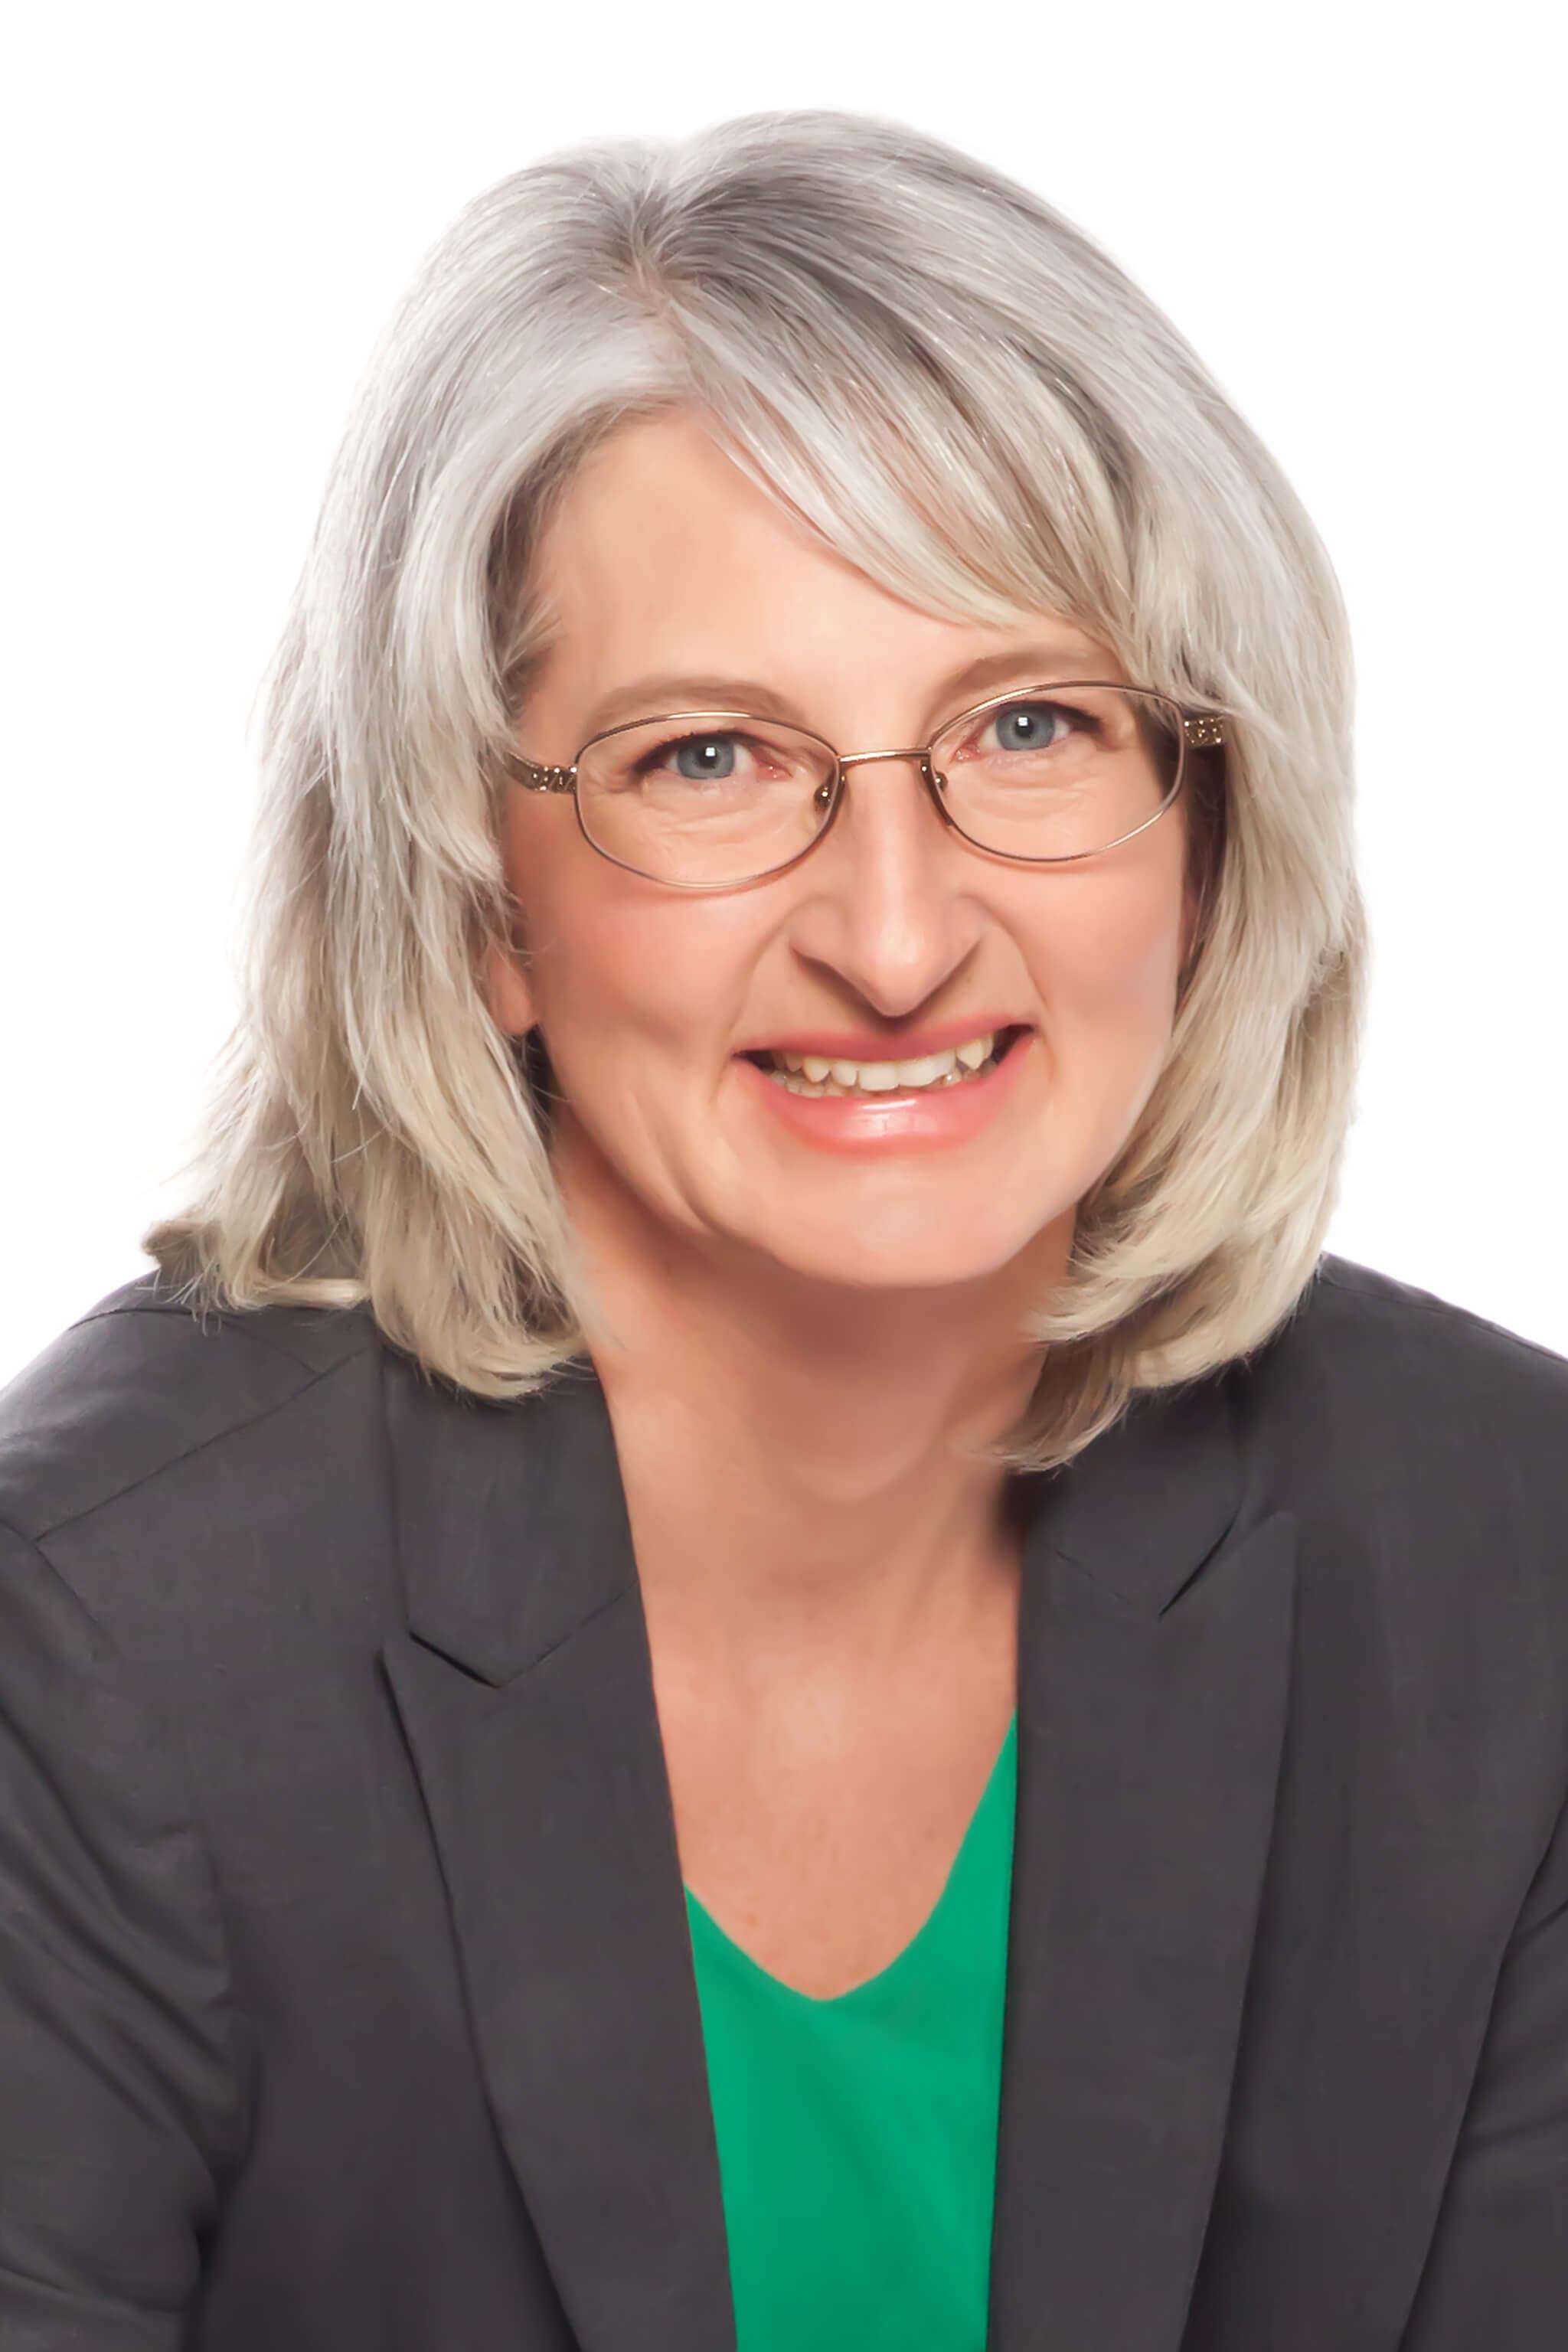 Rosamie Lohnes